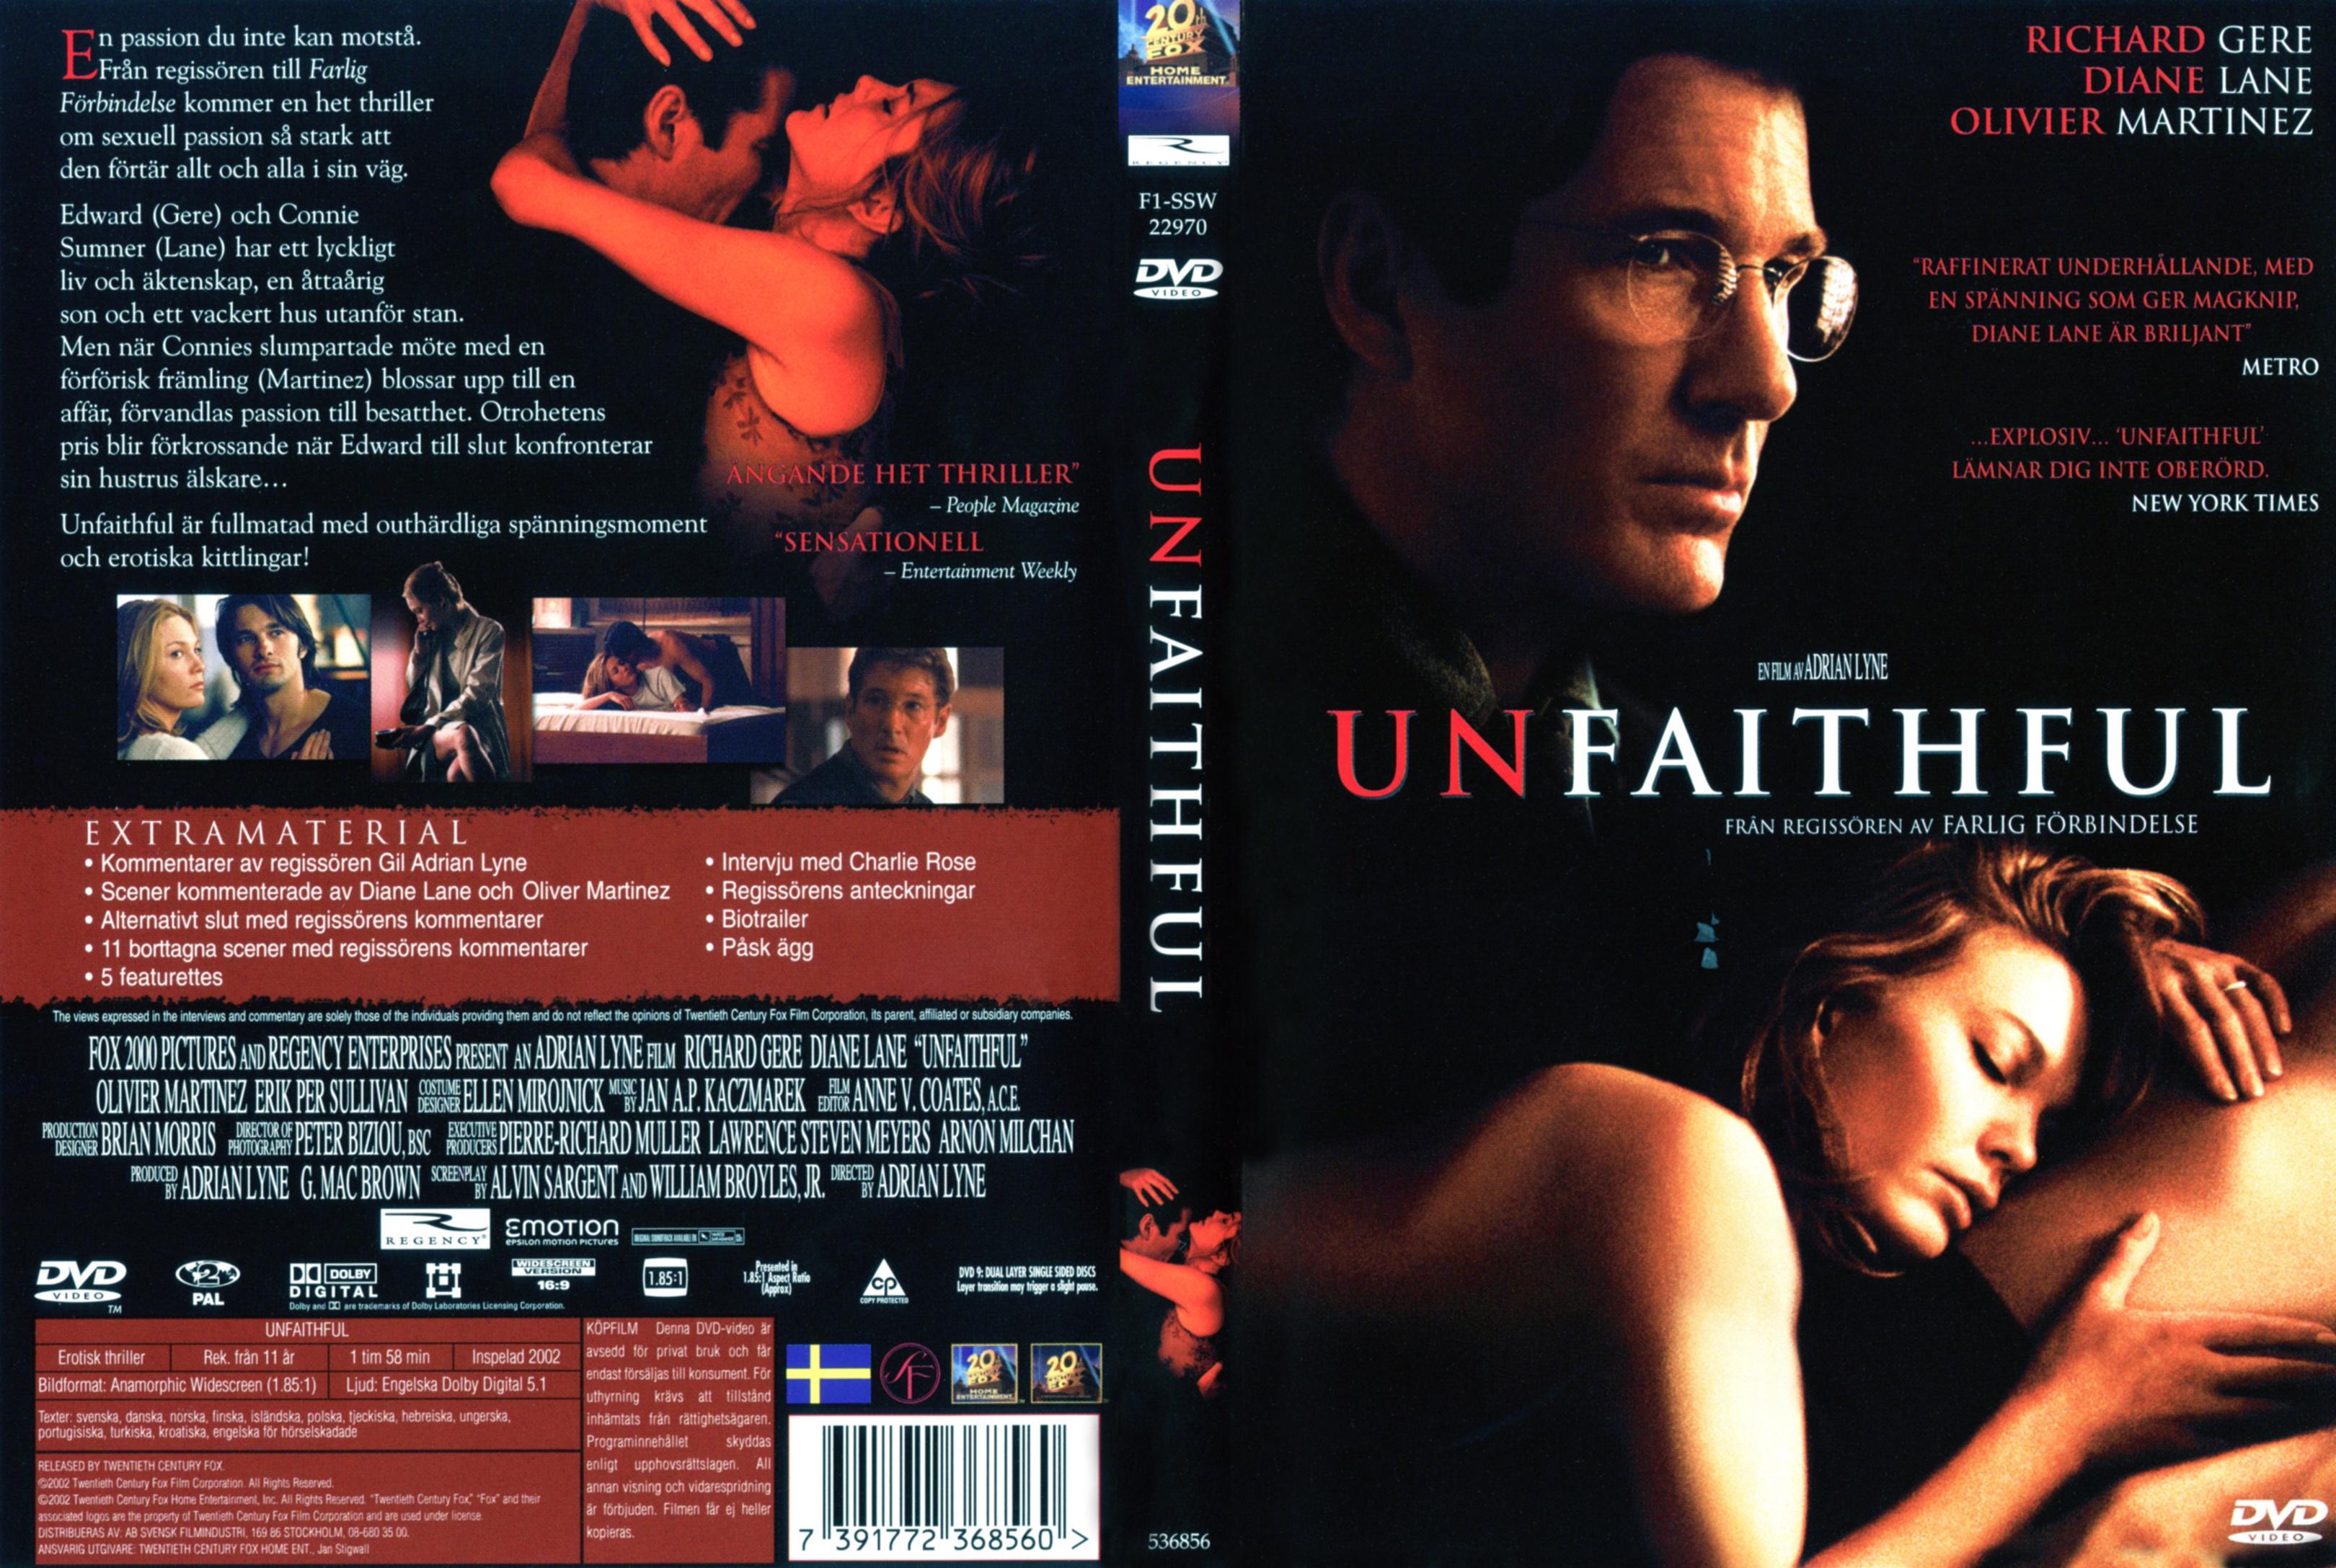 Unfaithful movie